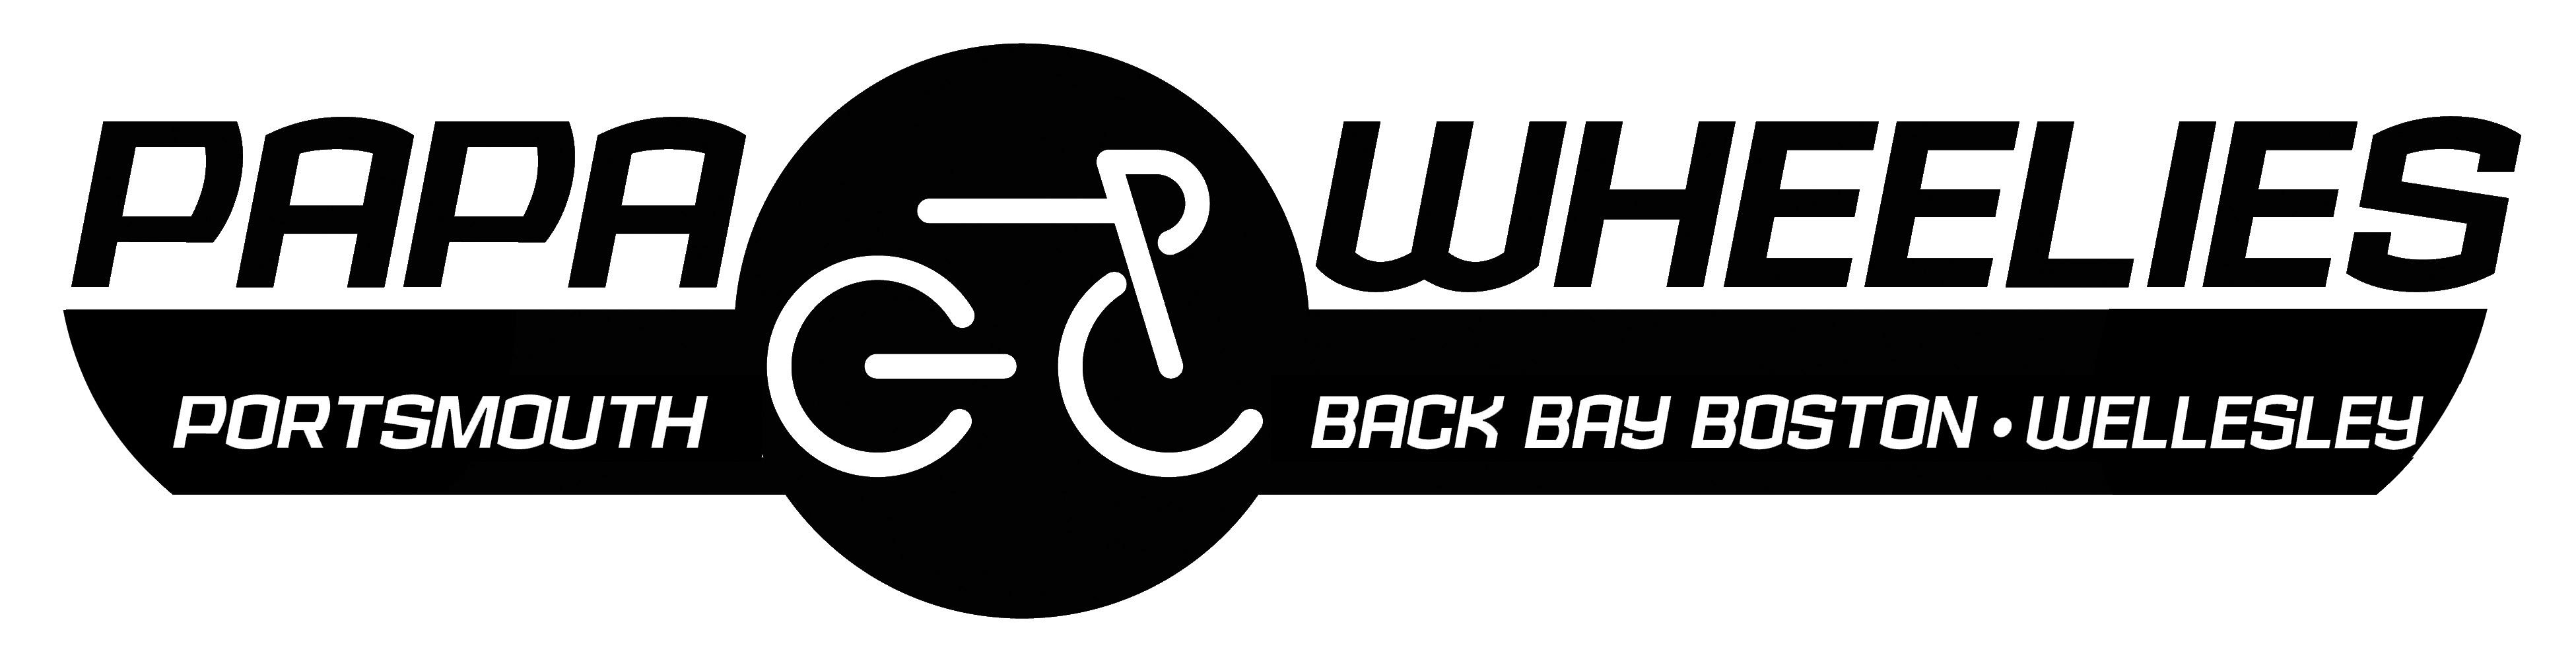 Papa Wheelies Bicycle Shops Home Page